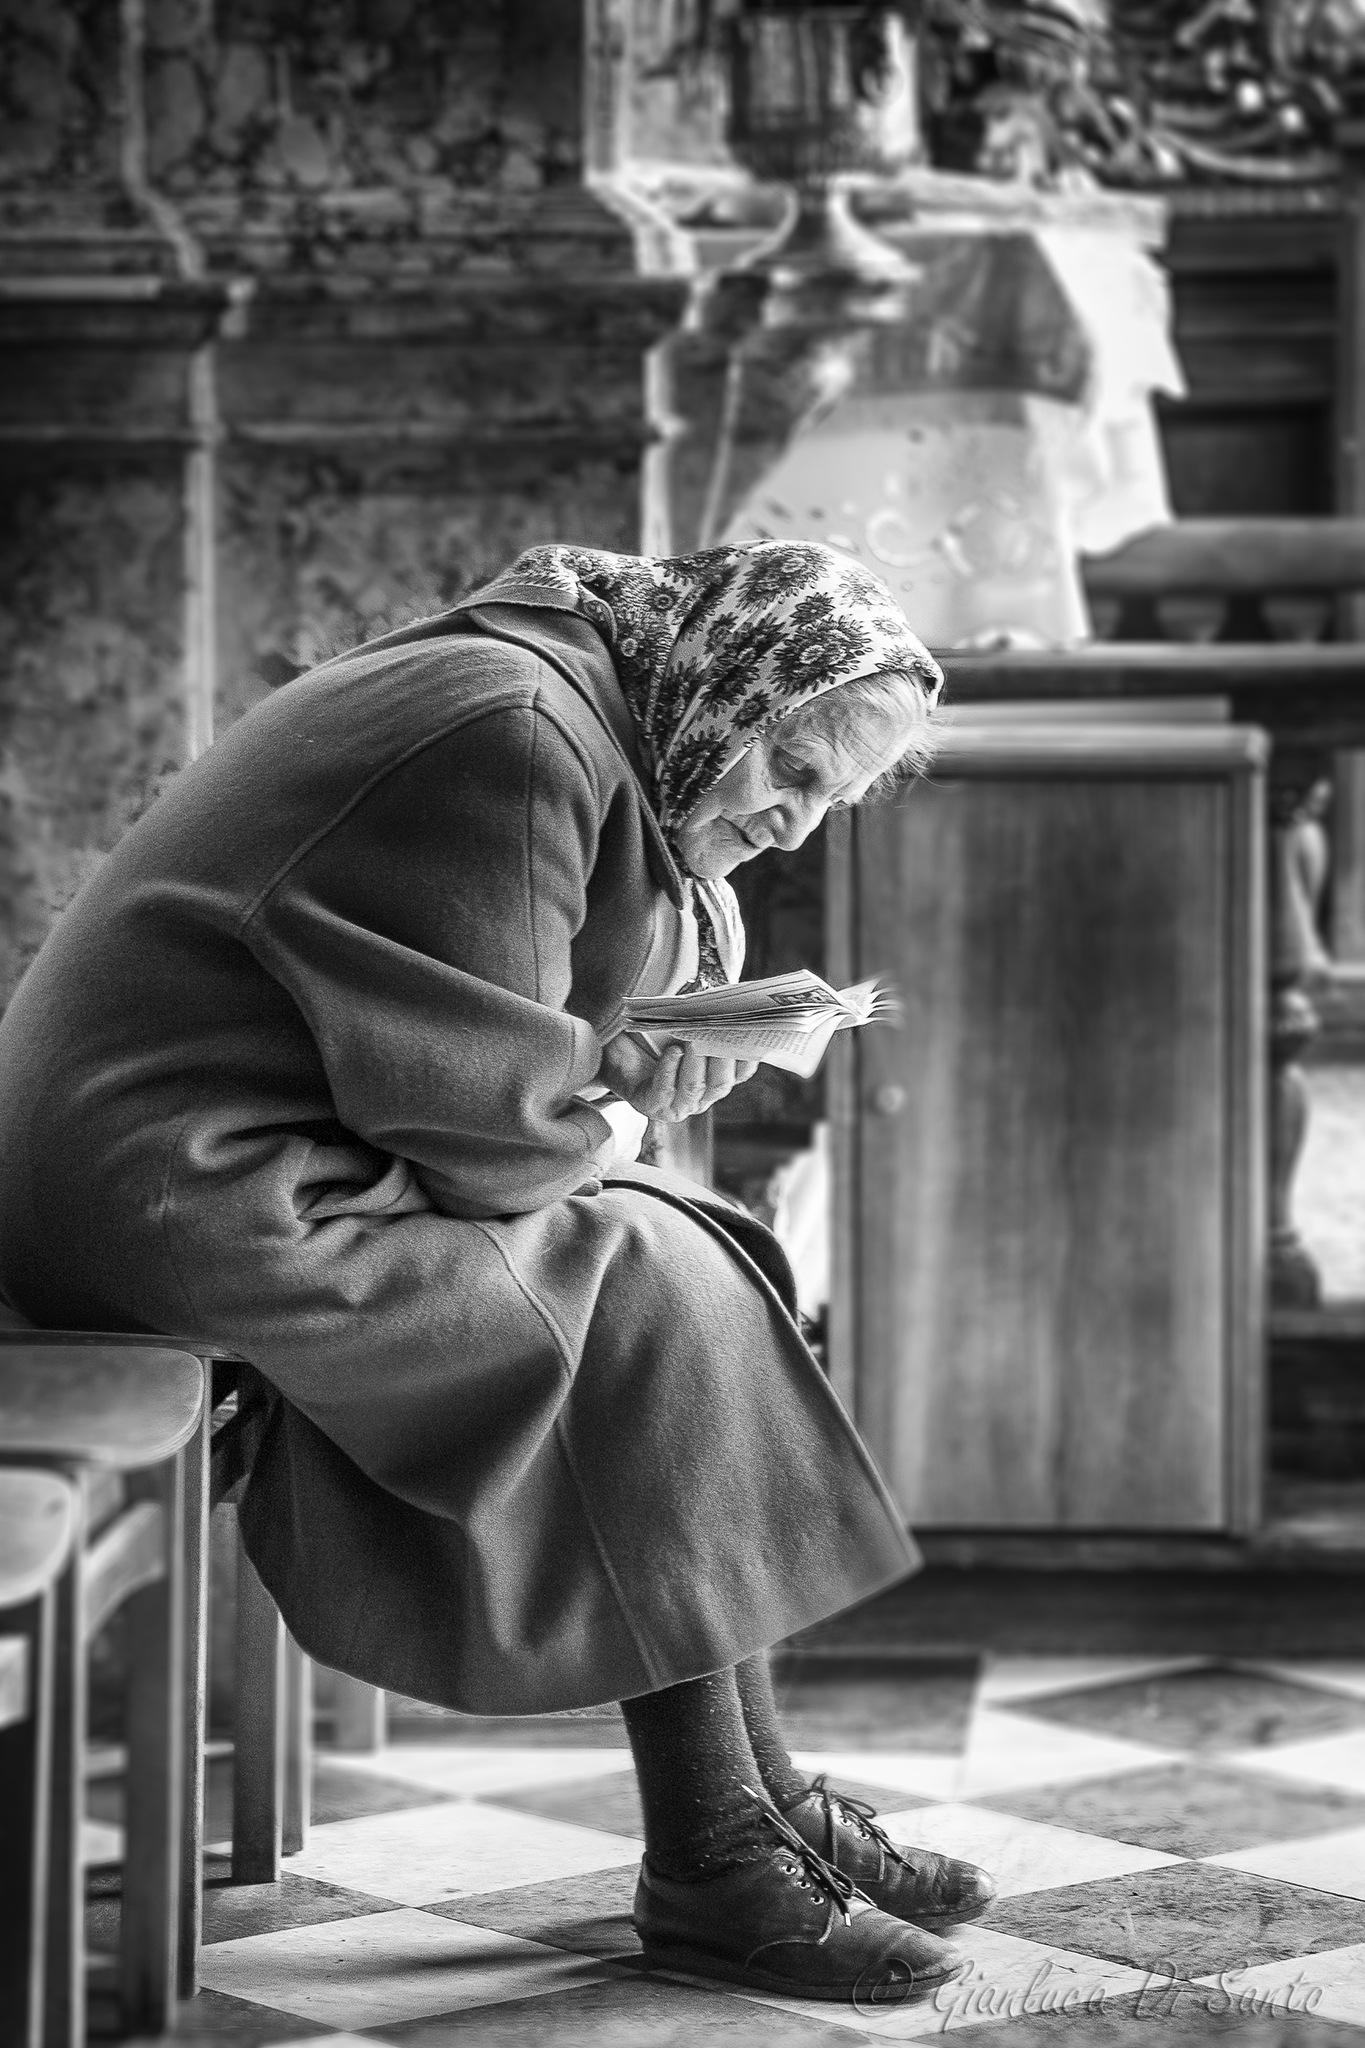 Prayers by Gianluca Di Santo